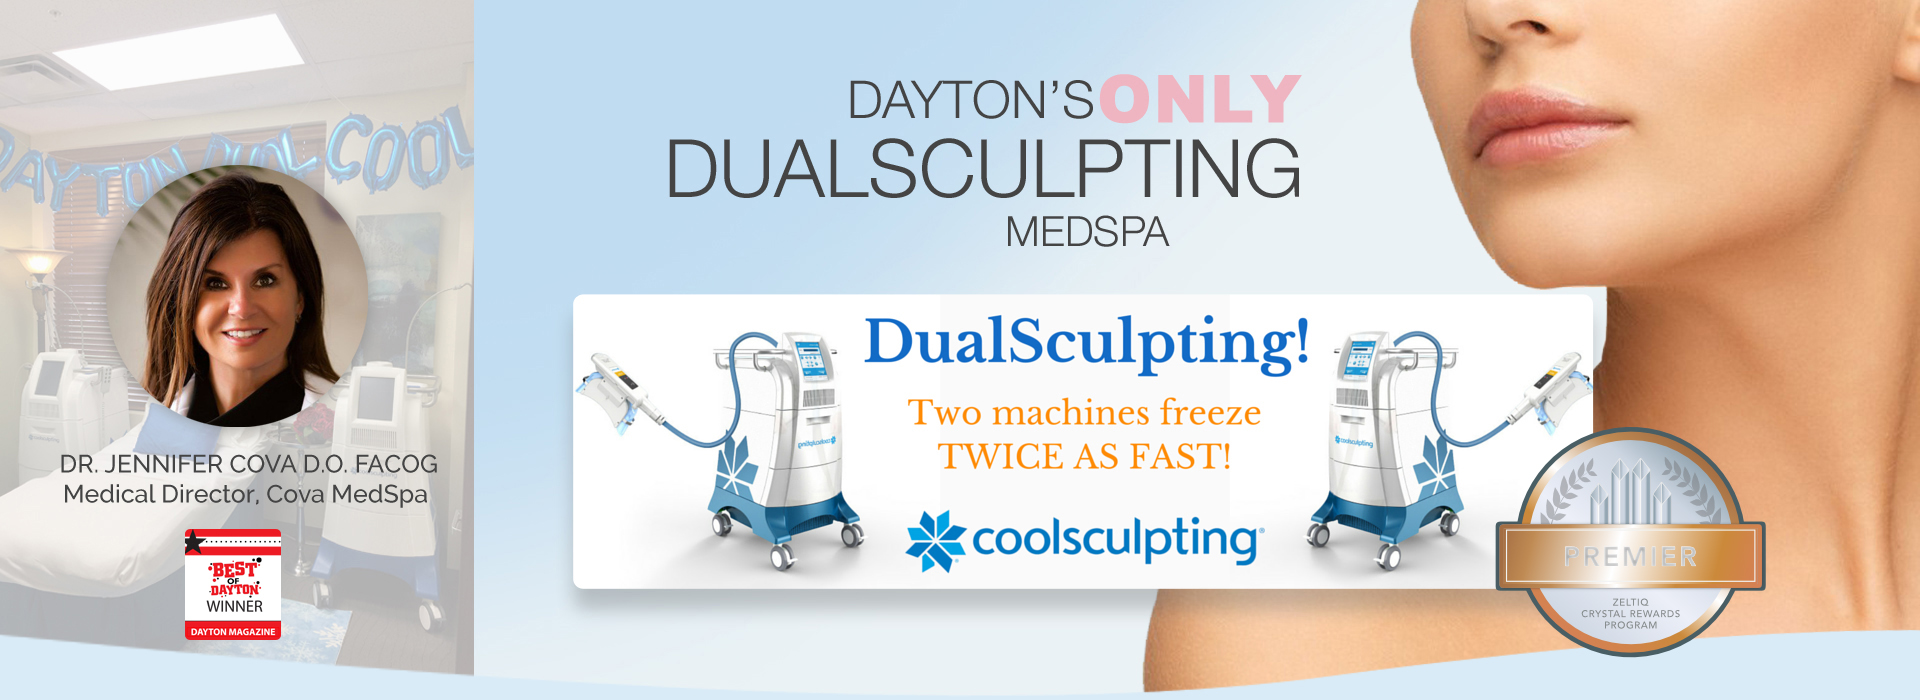 Dayton Dual CoolSculpting by Cova Medspa